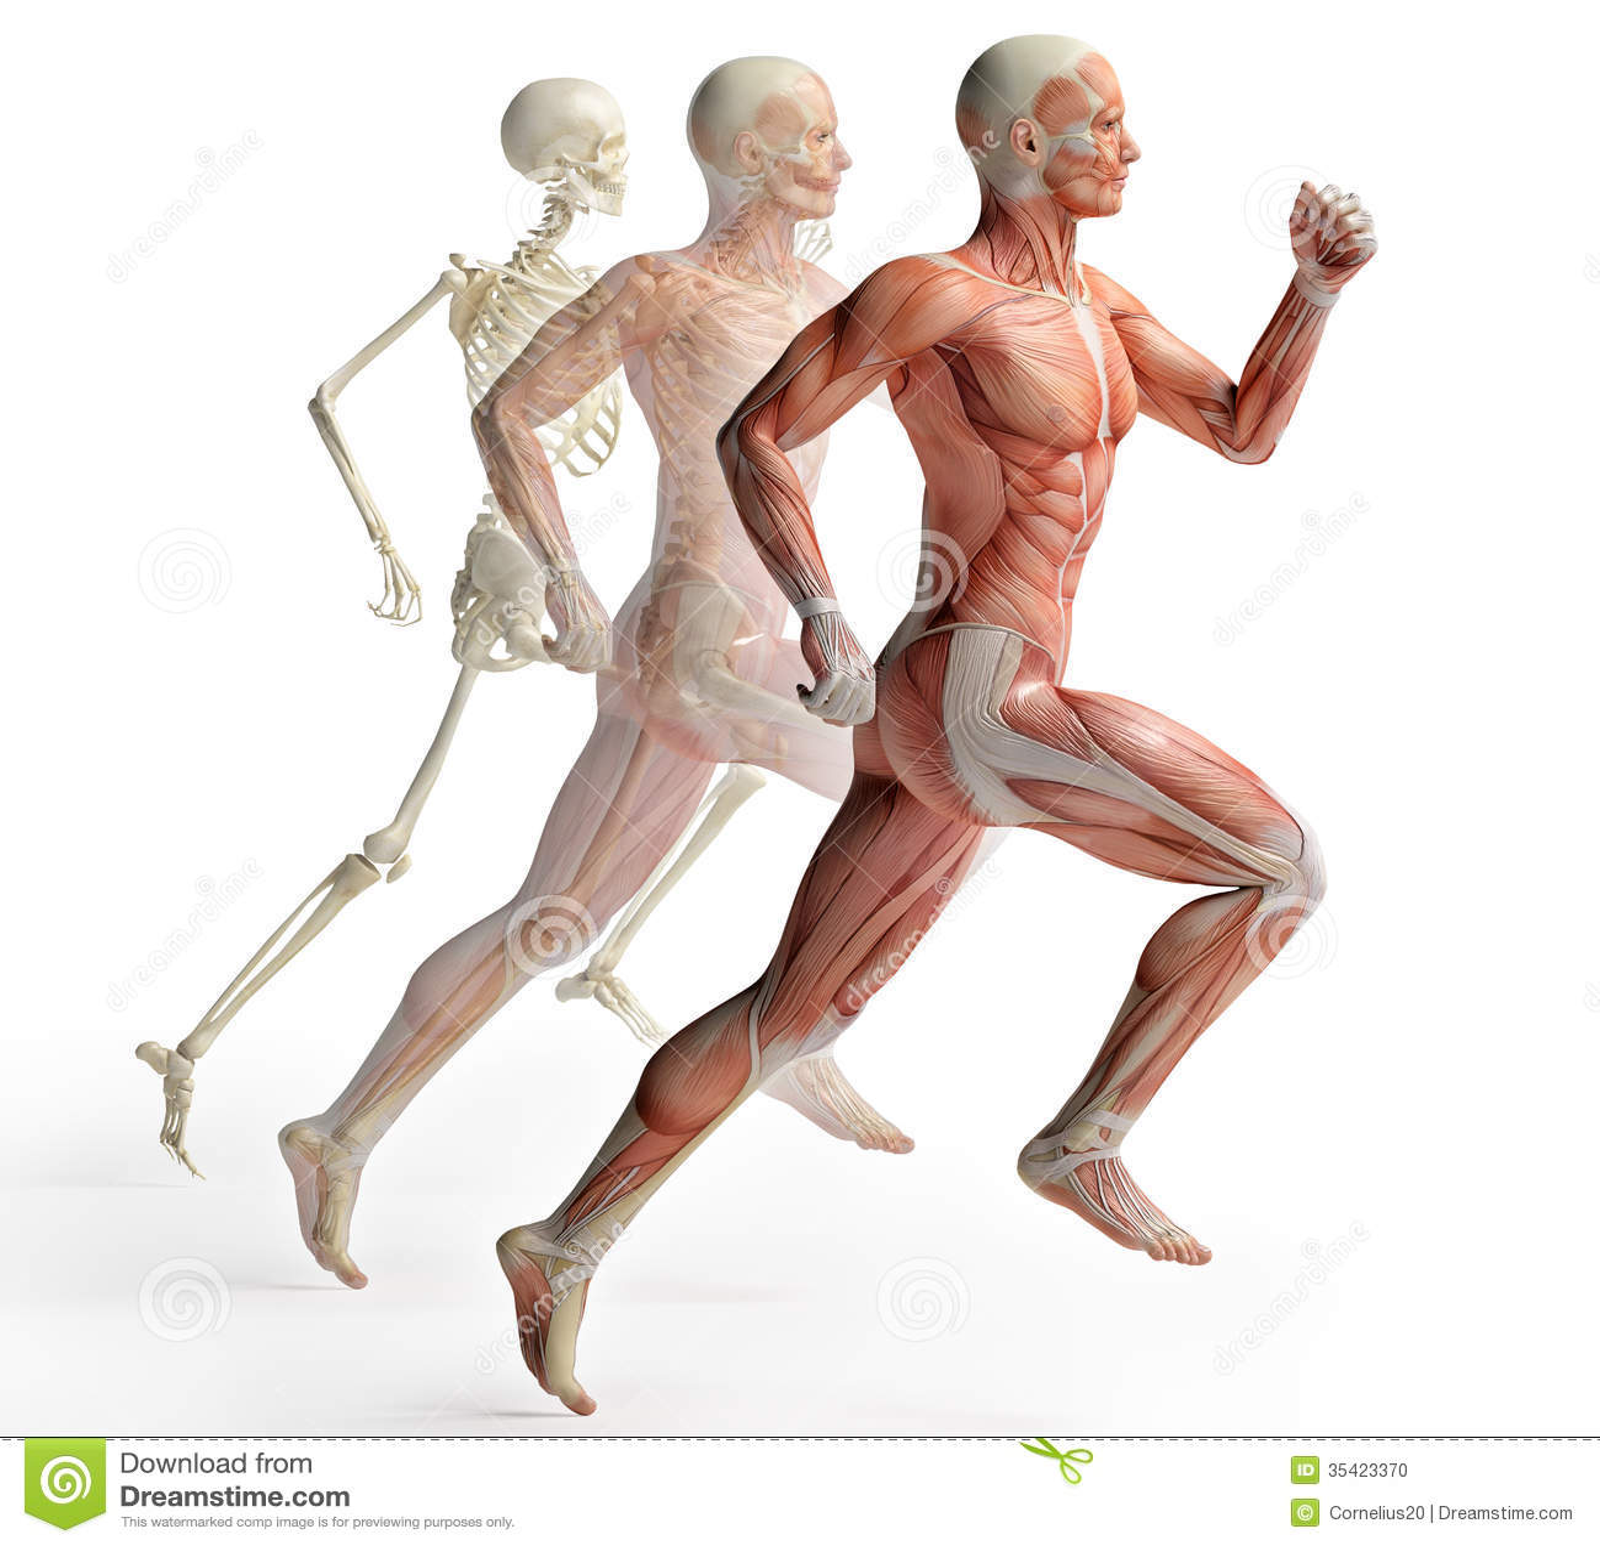 Male anatomy running stock illustration. Illustration of musculature ...